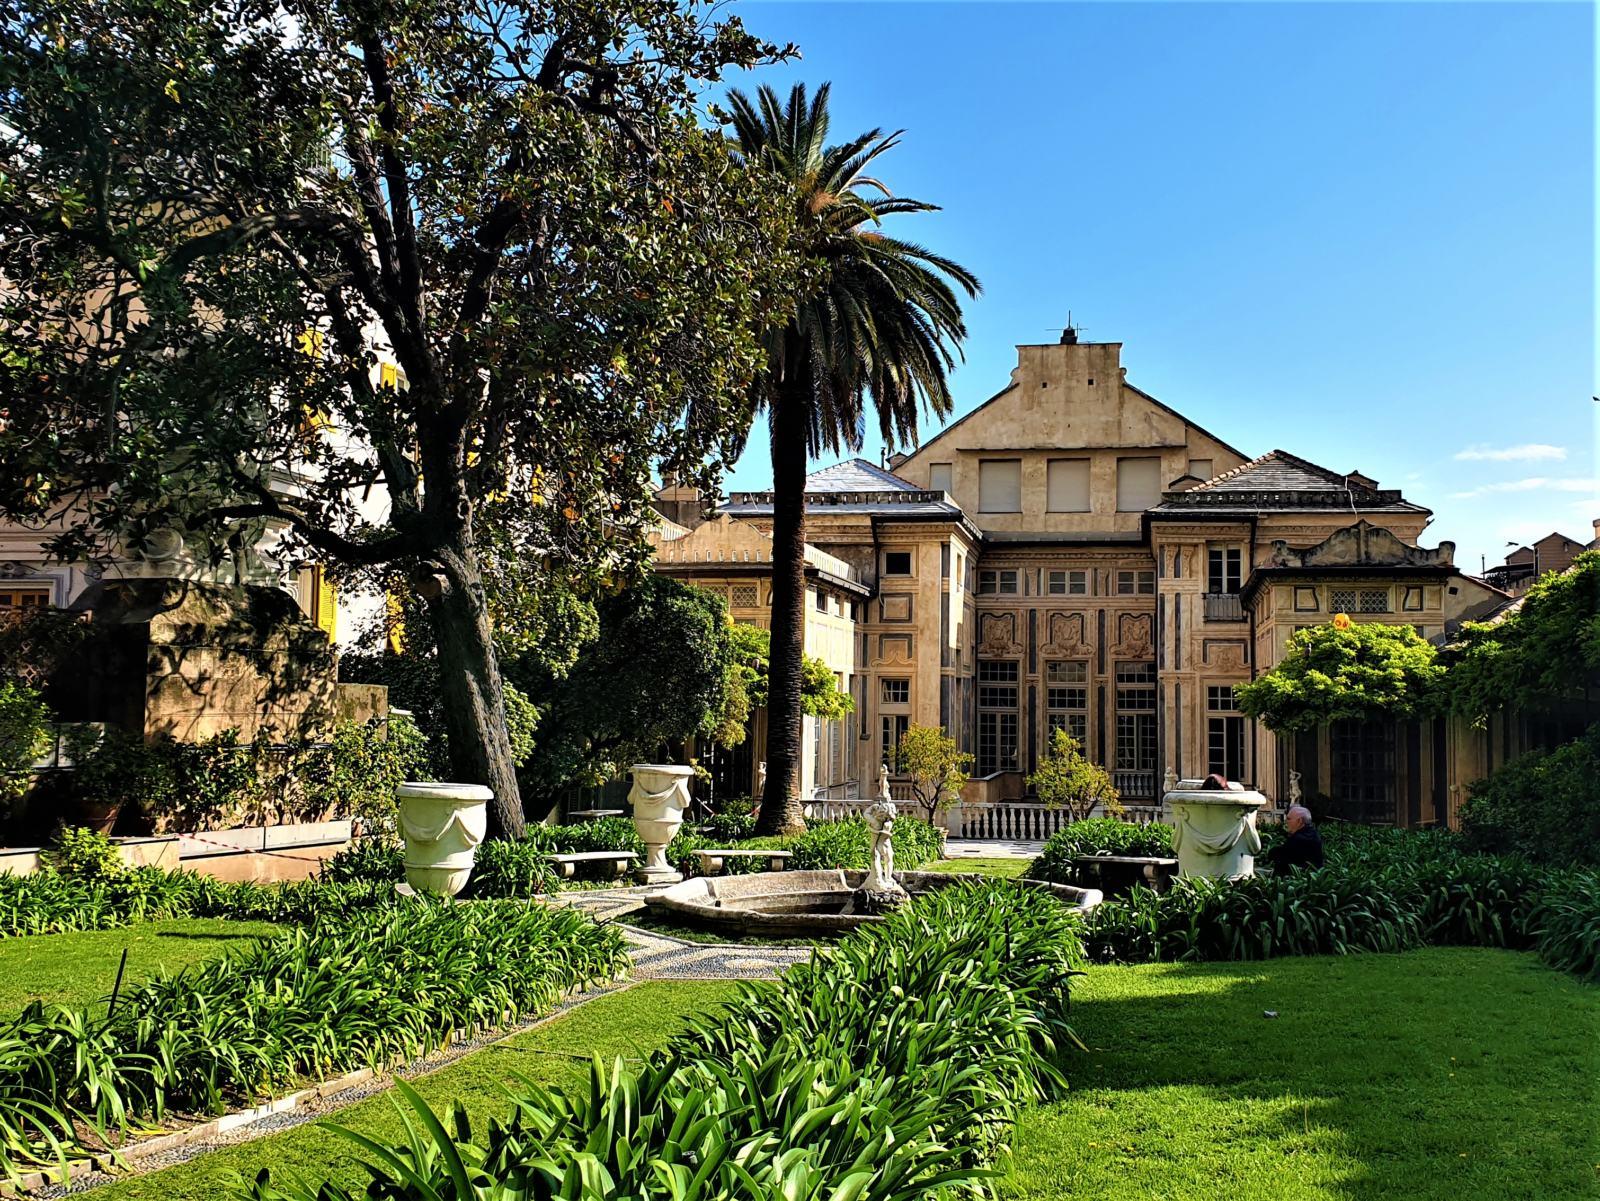 Giardino Palazzo Lomellini